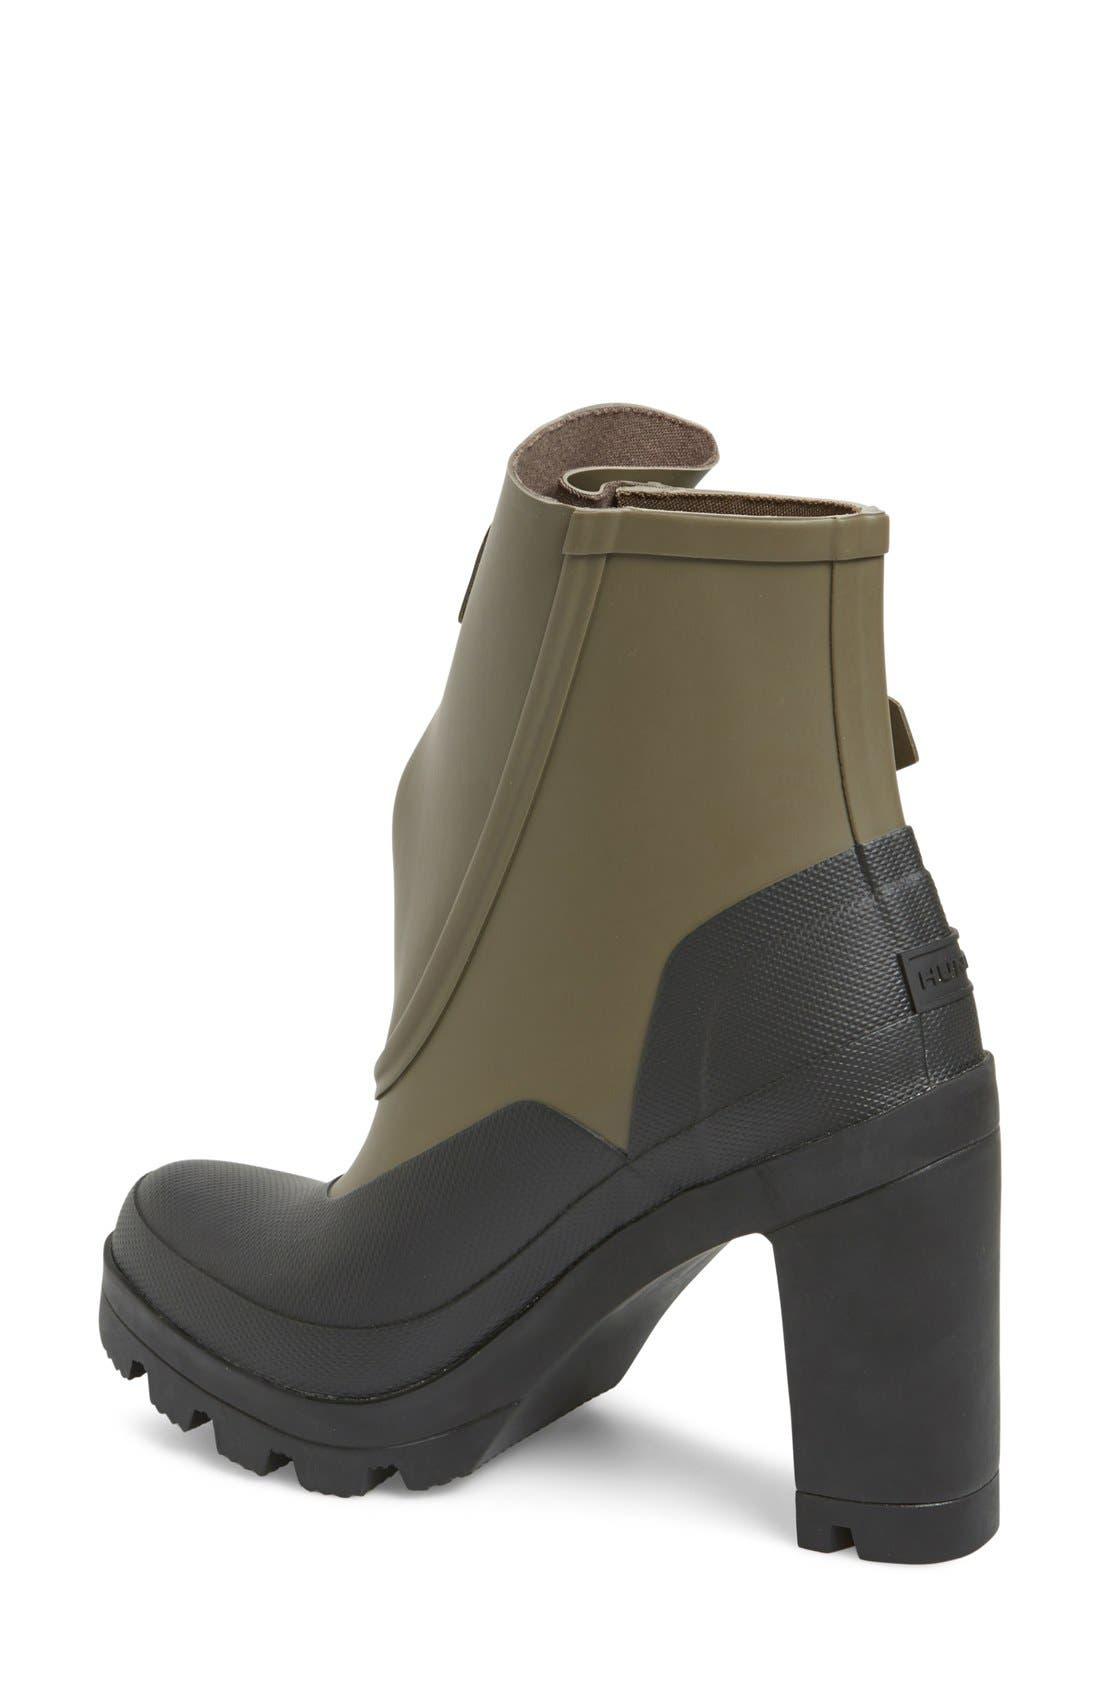 Alternate Image 2  - Hunter 'Original Galosh' Waterproof Ankle Bootie (Women)